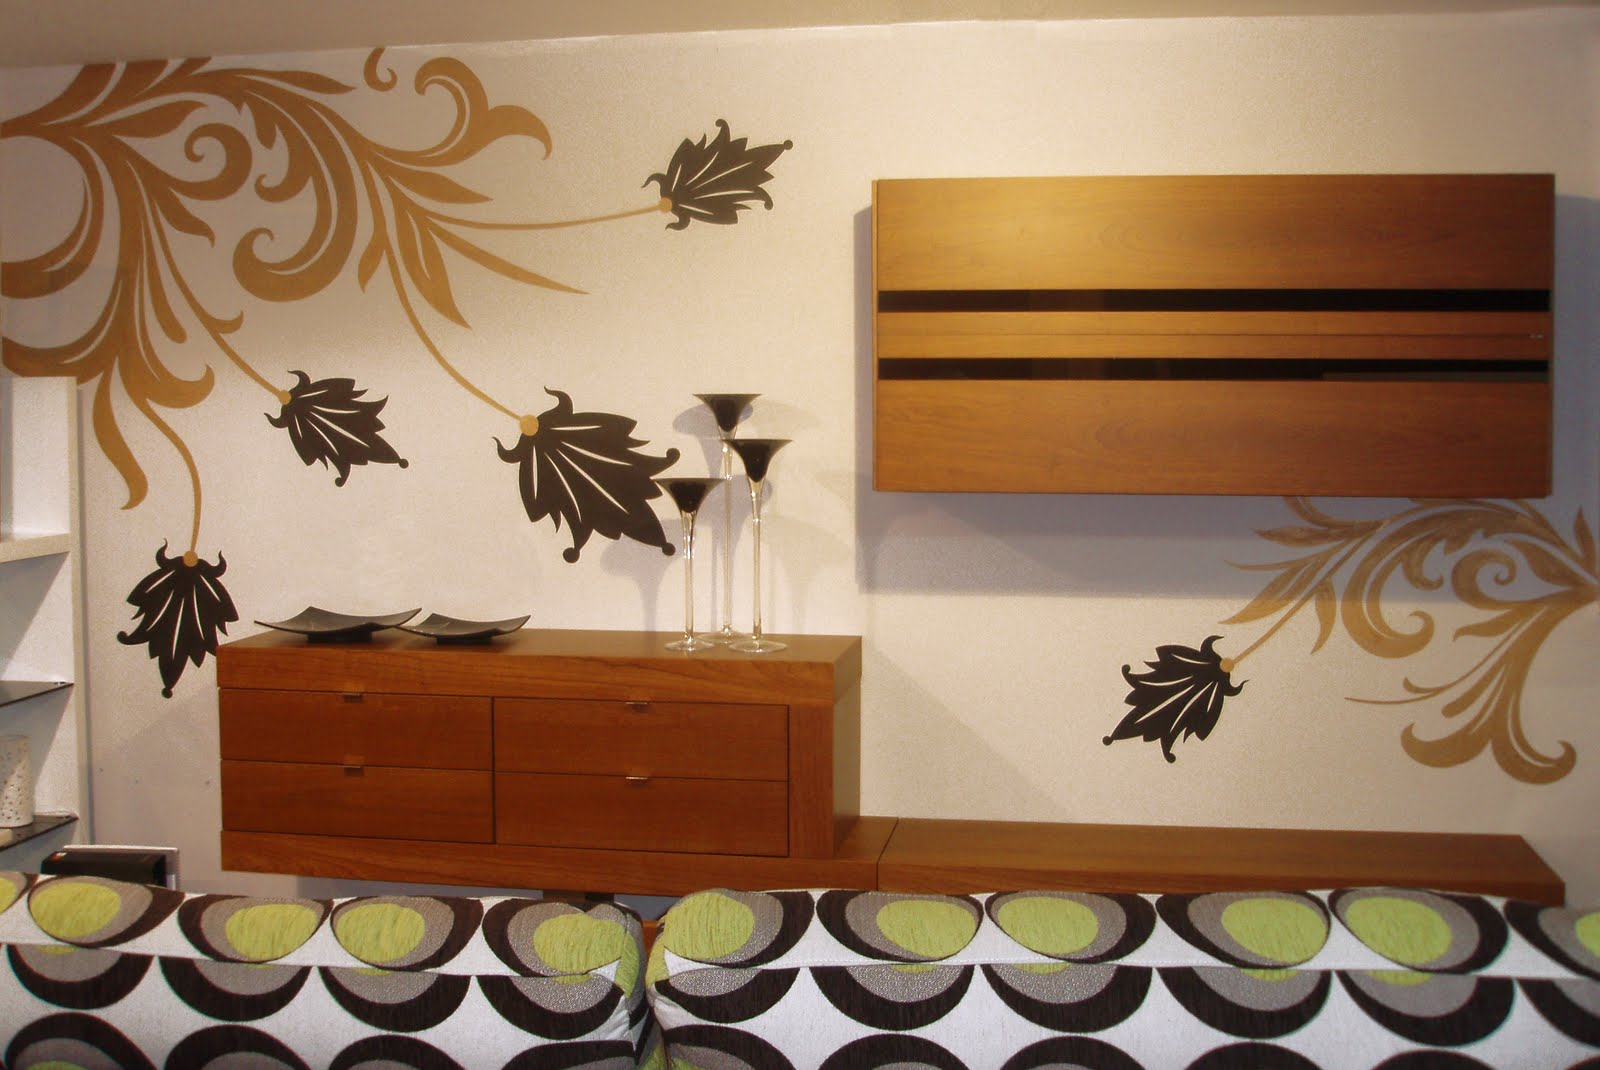 Muebles Murales Para Salon Muebles Para Saln Y Muebles Modernos  # Muebles Murales